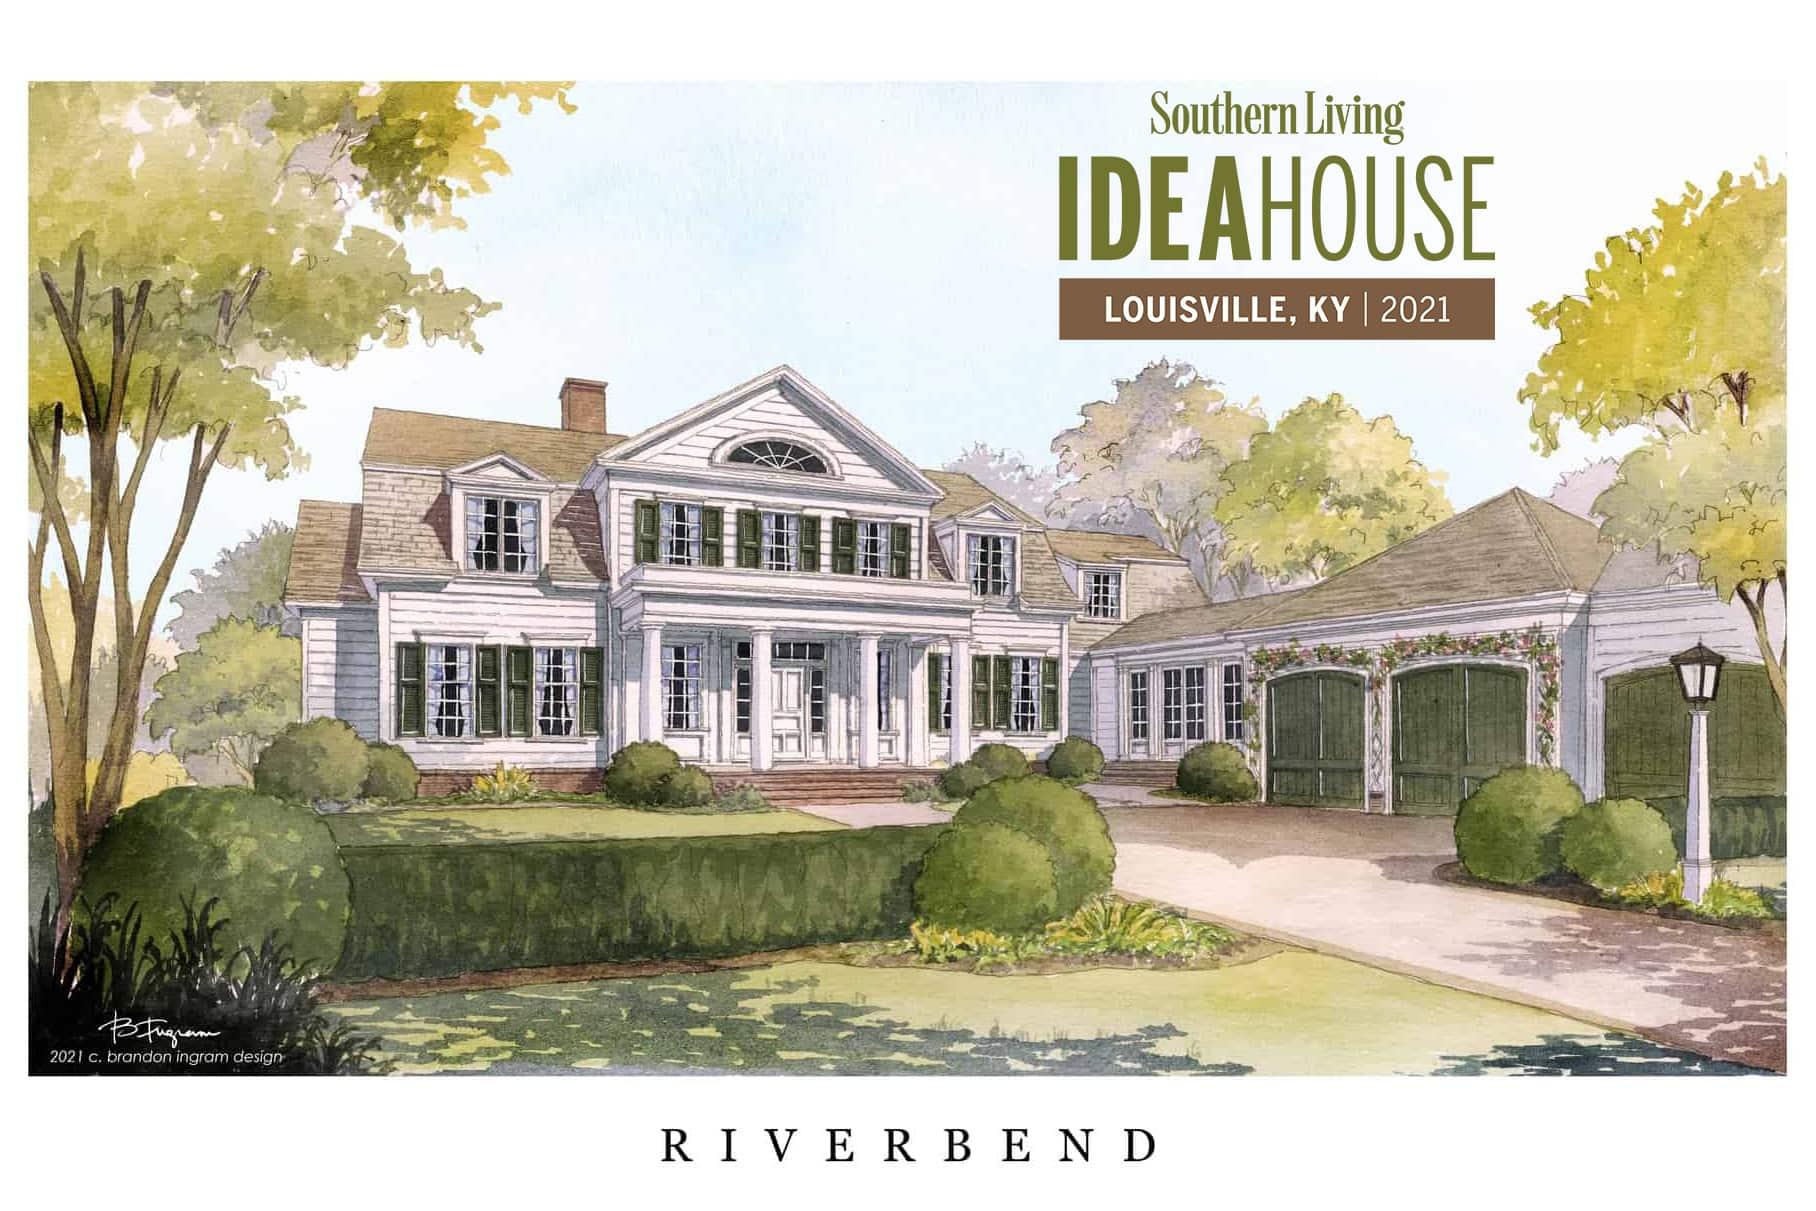 Southern Living Idea House Kentucky